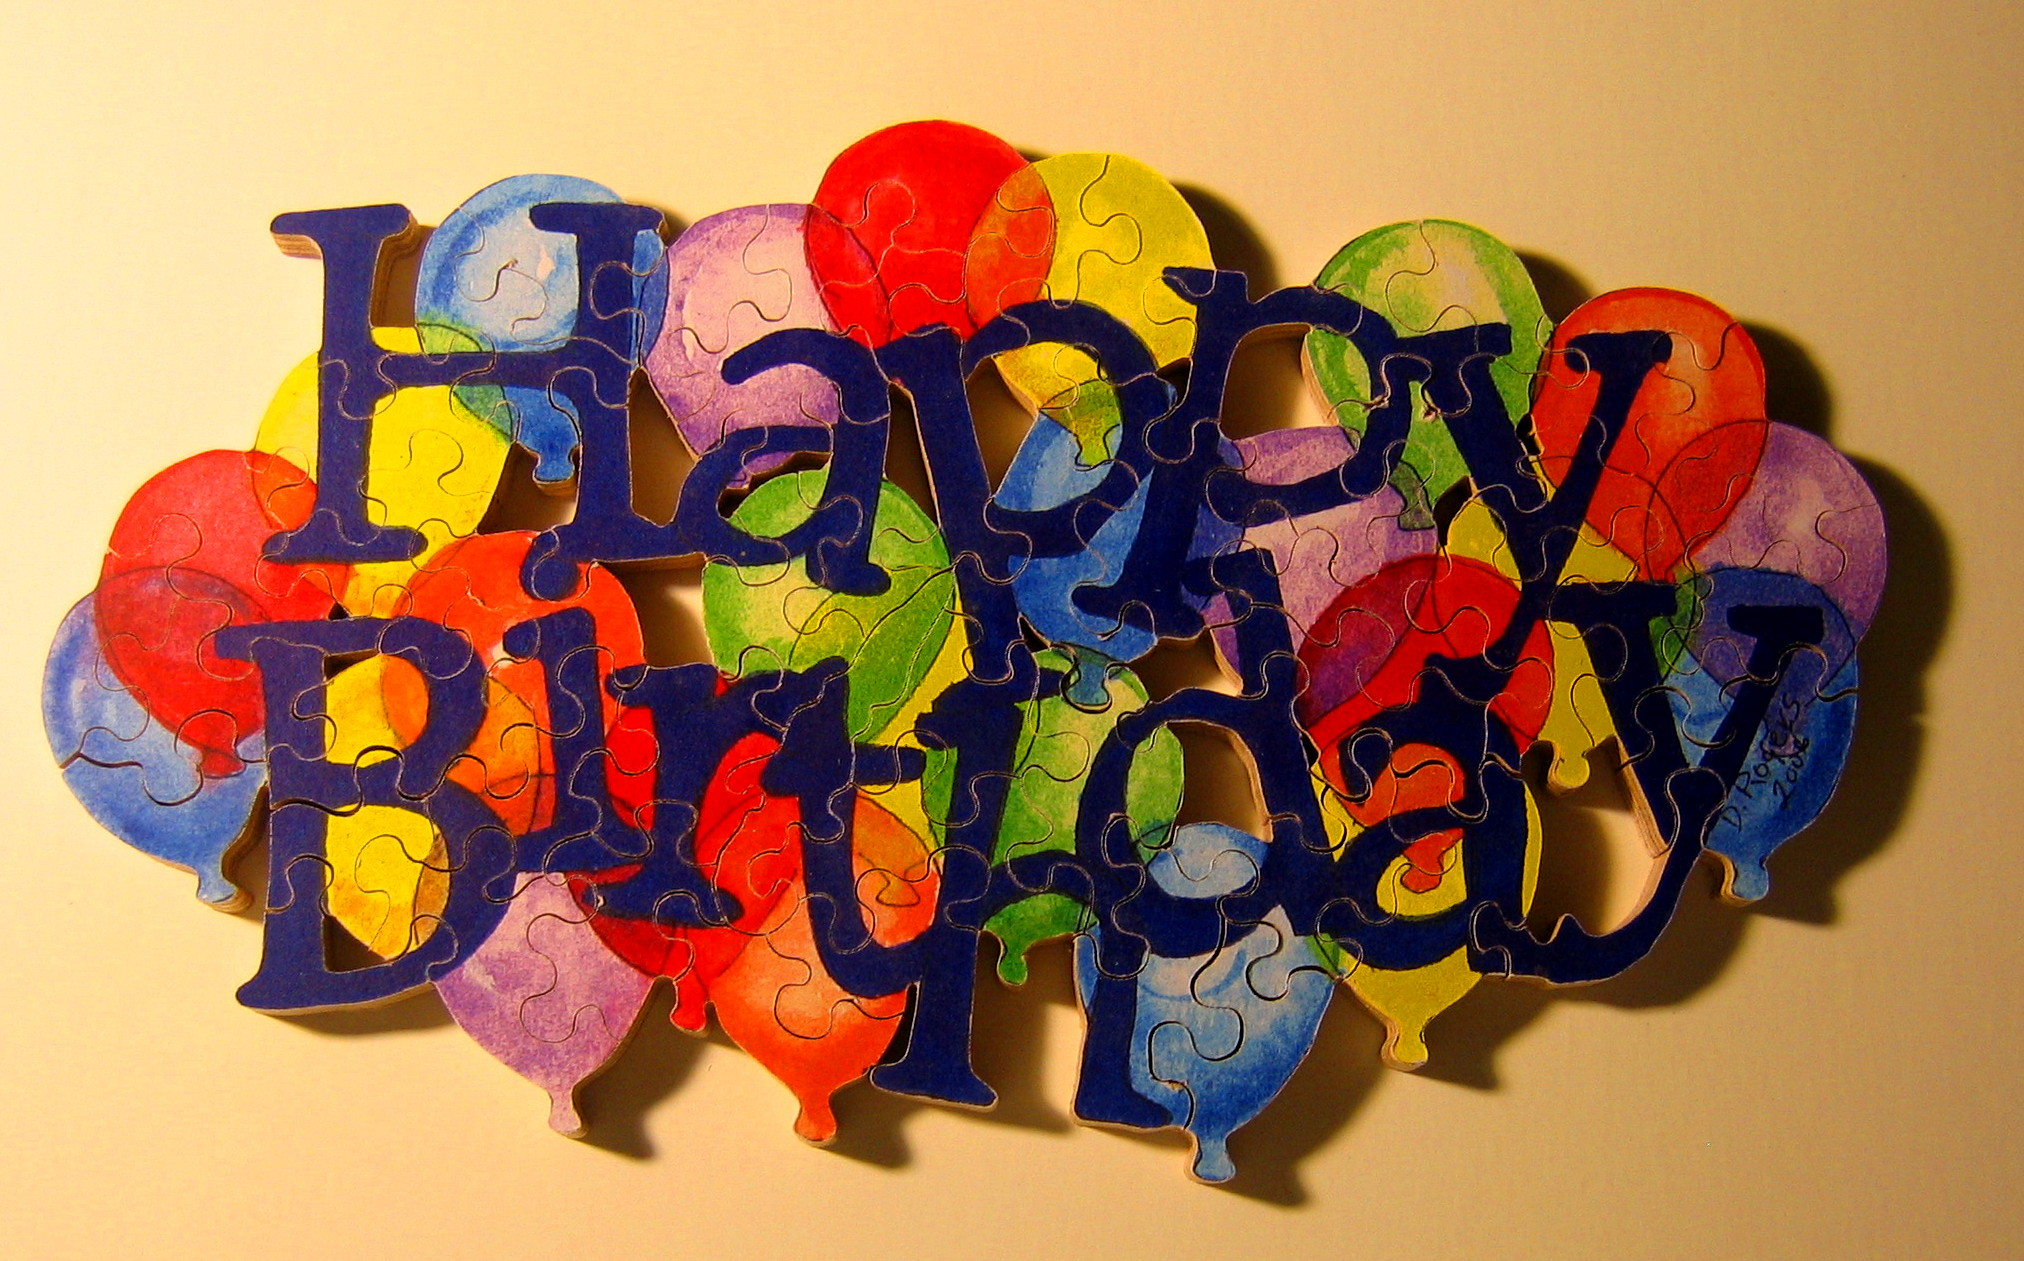 С днем рождения, Маня!!!!!(Mana-mana)